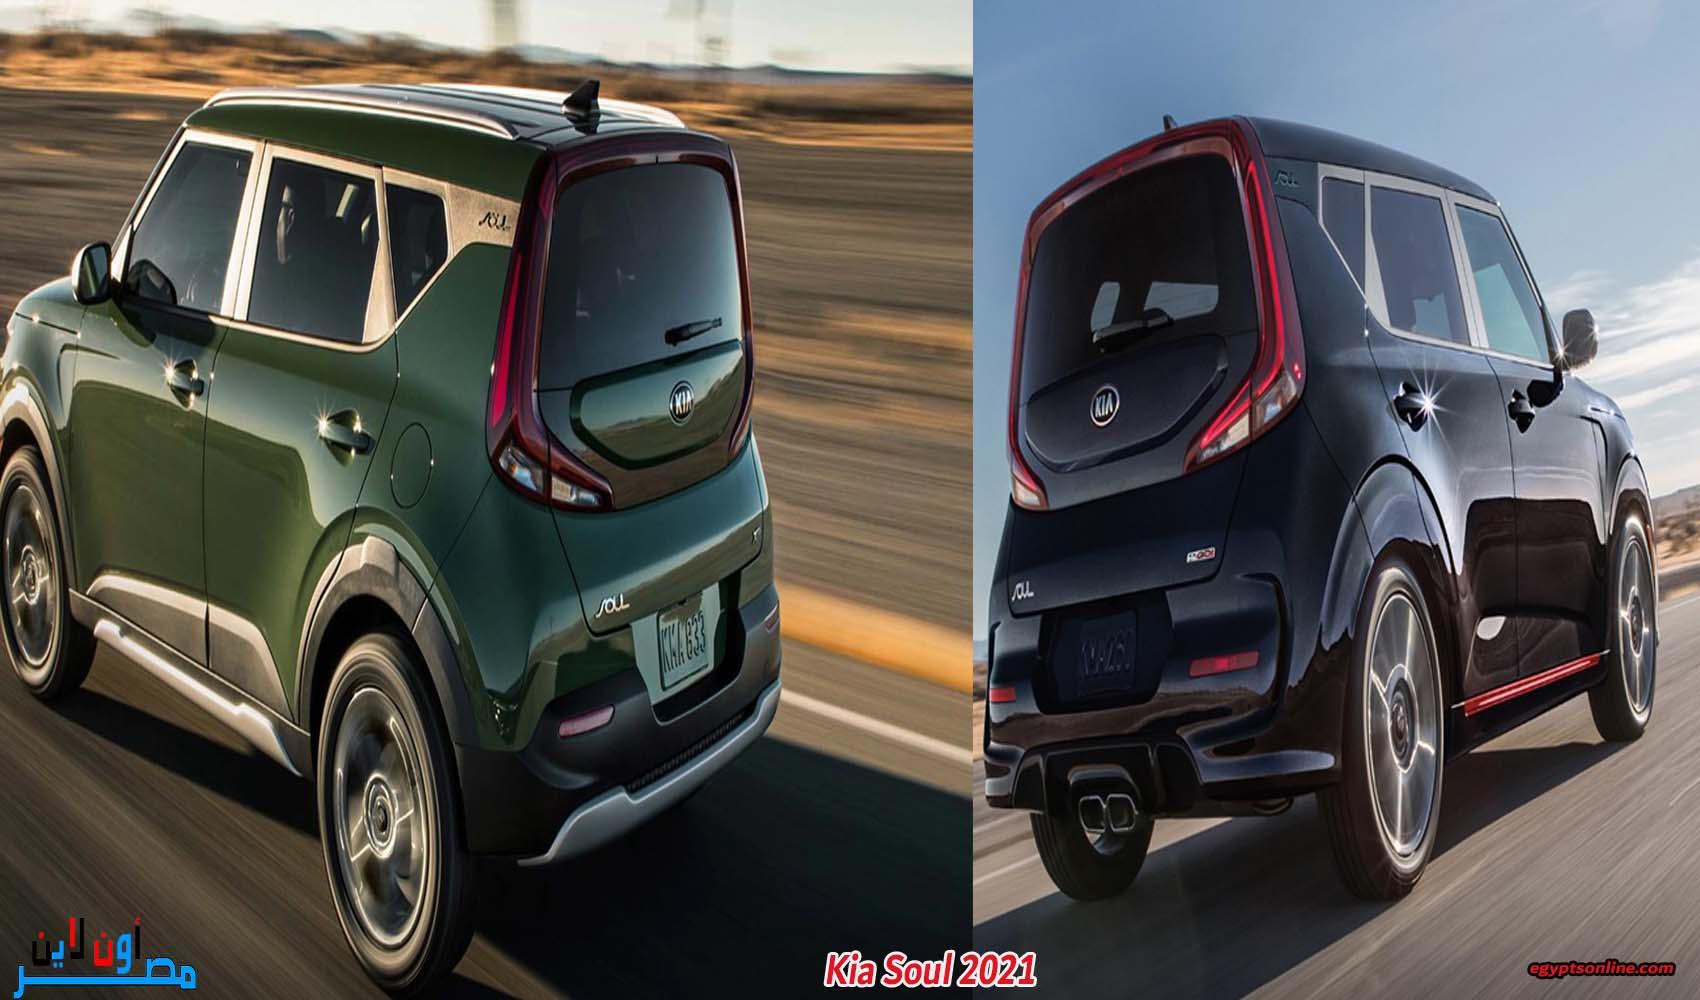 صور سيارات كيا سول2021 Kia Soul، سيارات كيا، أنواع سيارات كيا، أسعار سيارات كيا